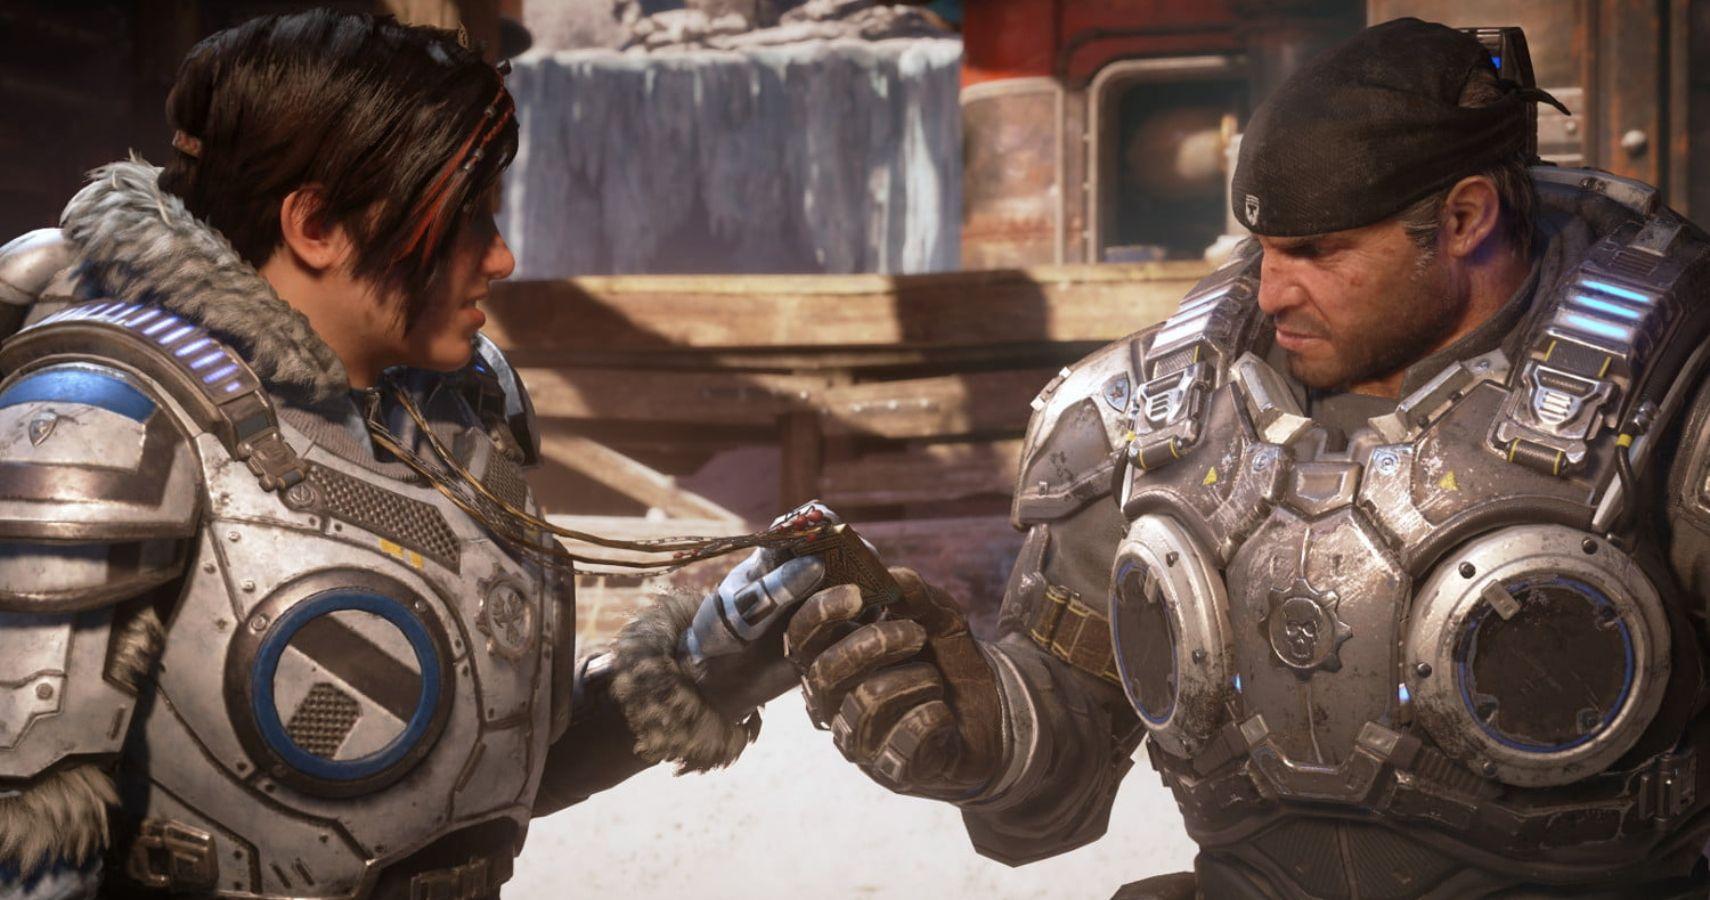 E3 2019 Gears 5 Marcus Fenix S Voice Actor Humiliates Guy